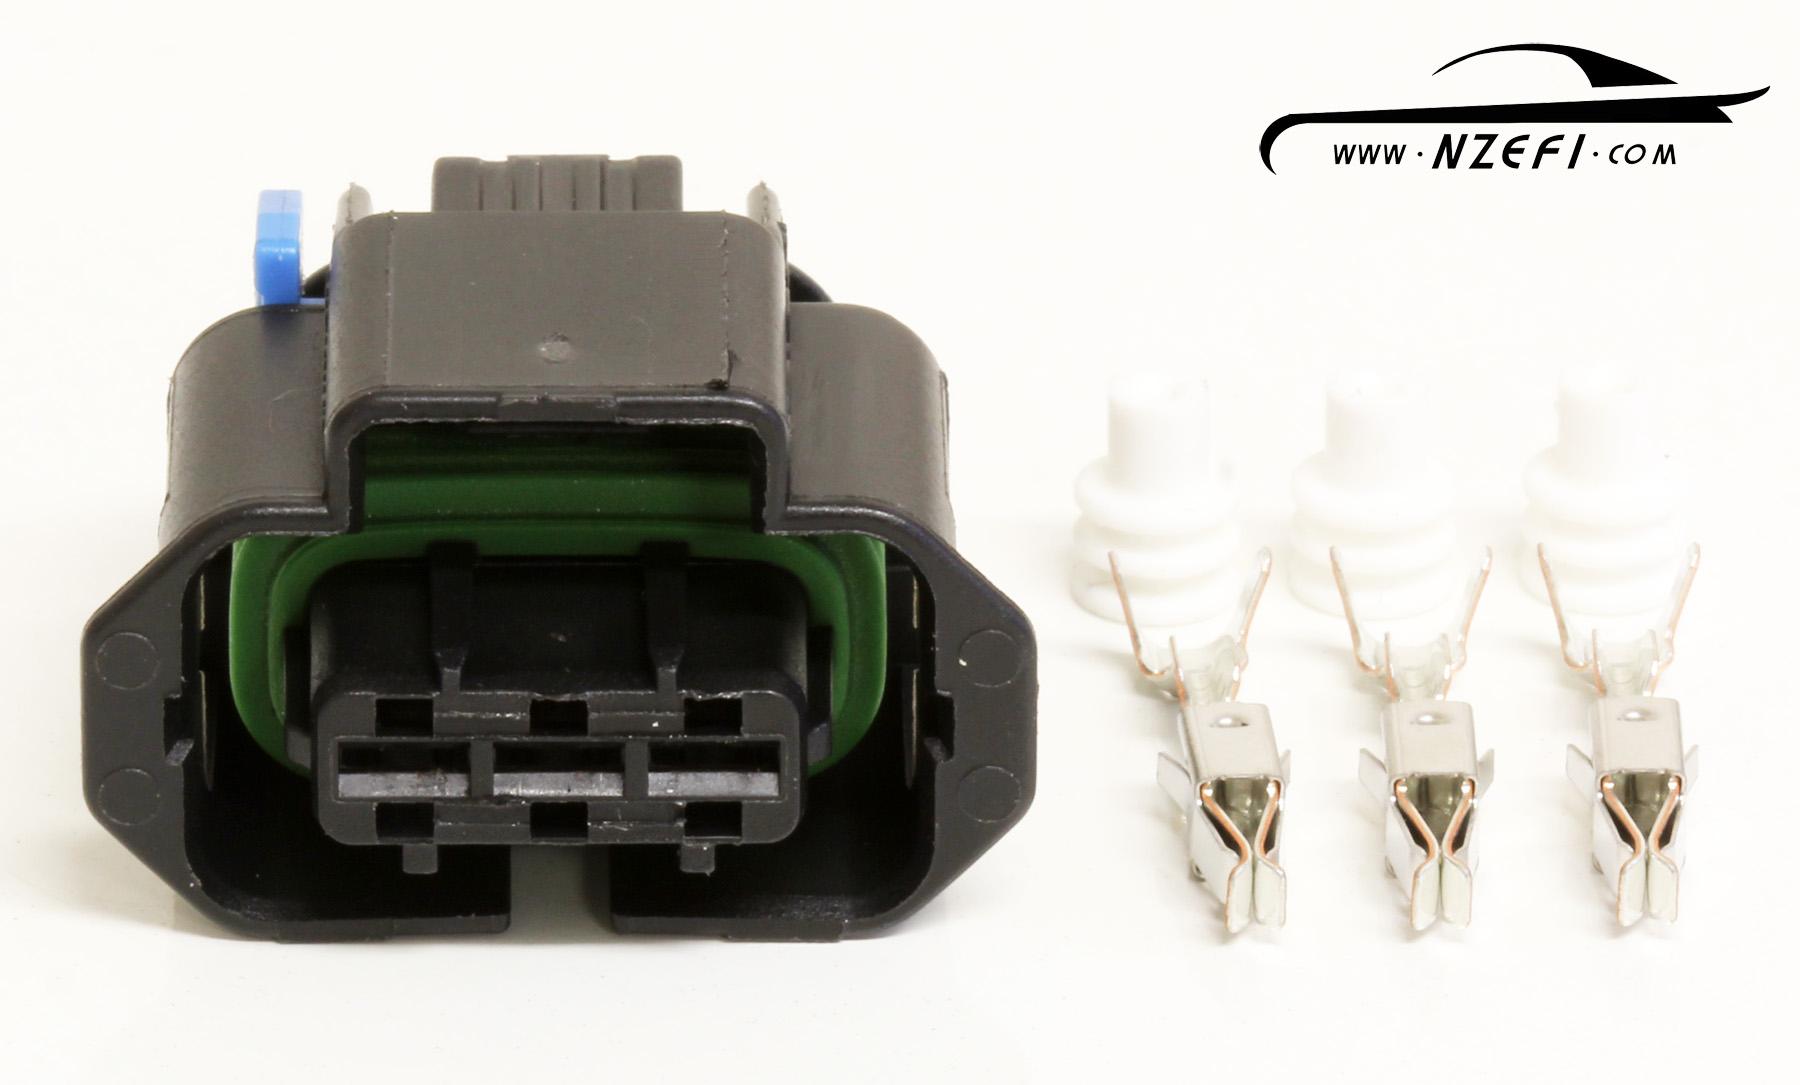 hight resolution of gm gen iv ls3 ls7 map sensor connector nzefi performance tuning